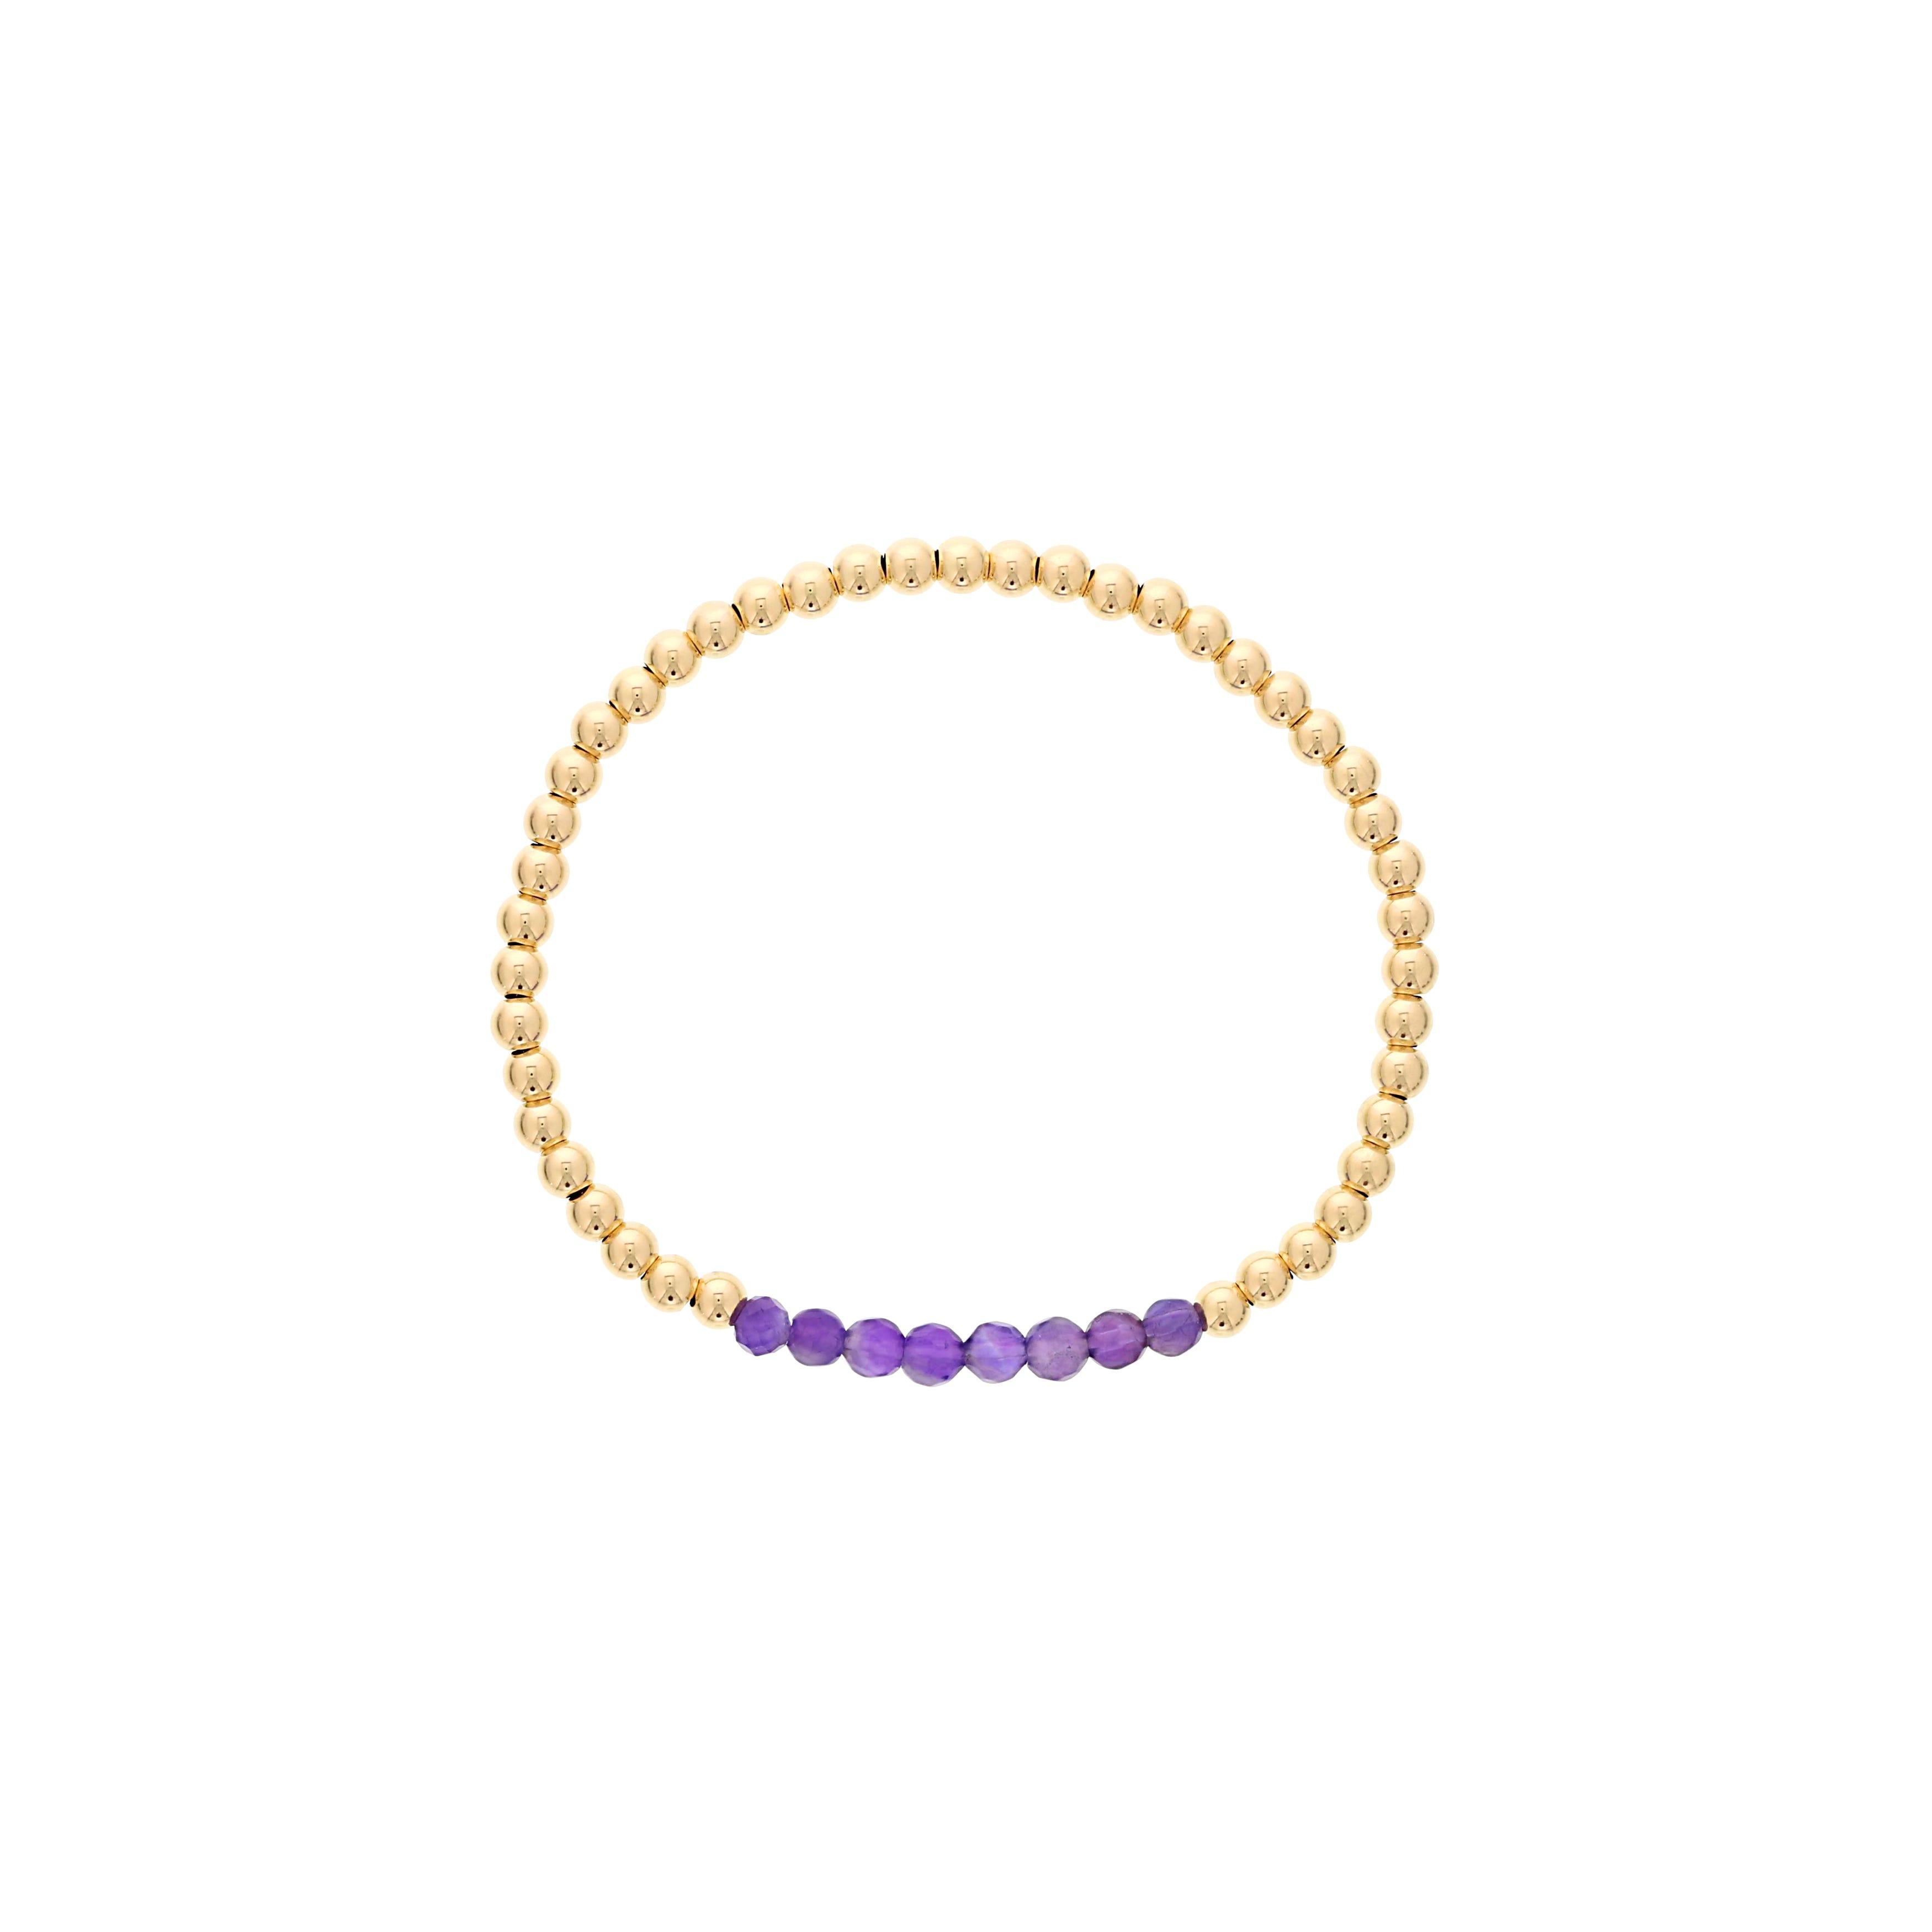 Amethyst Birthstone Beaded Bracelet Gold Filled